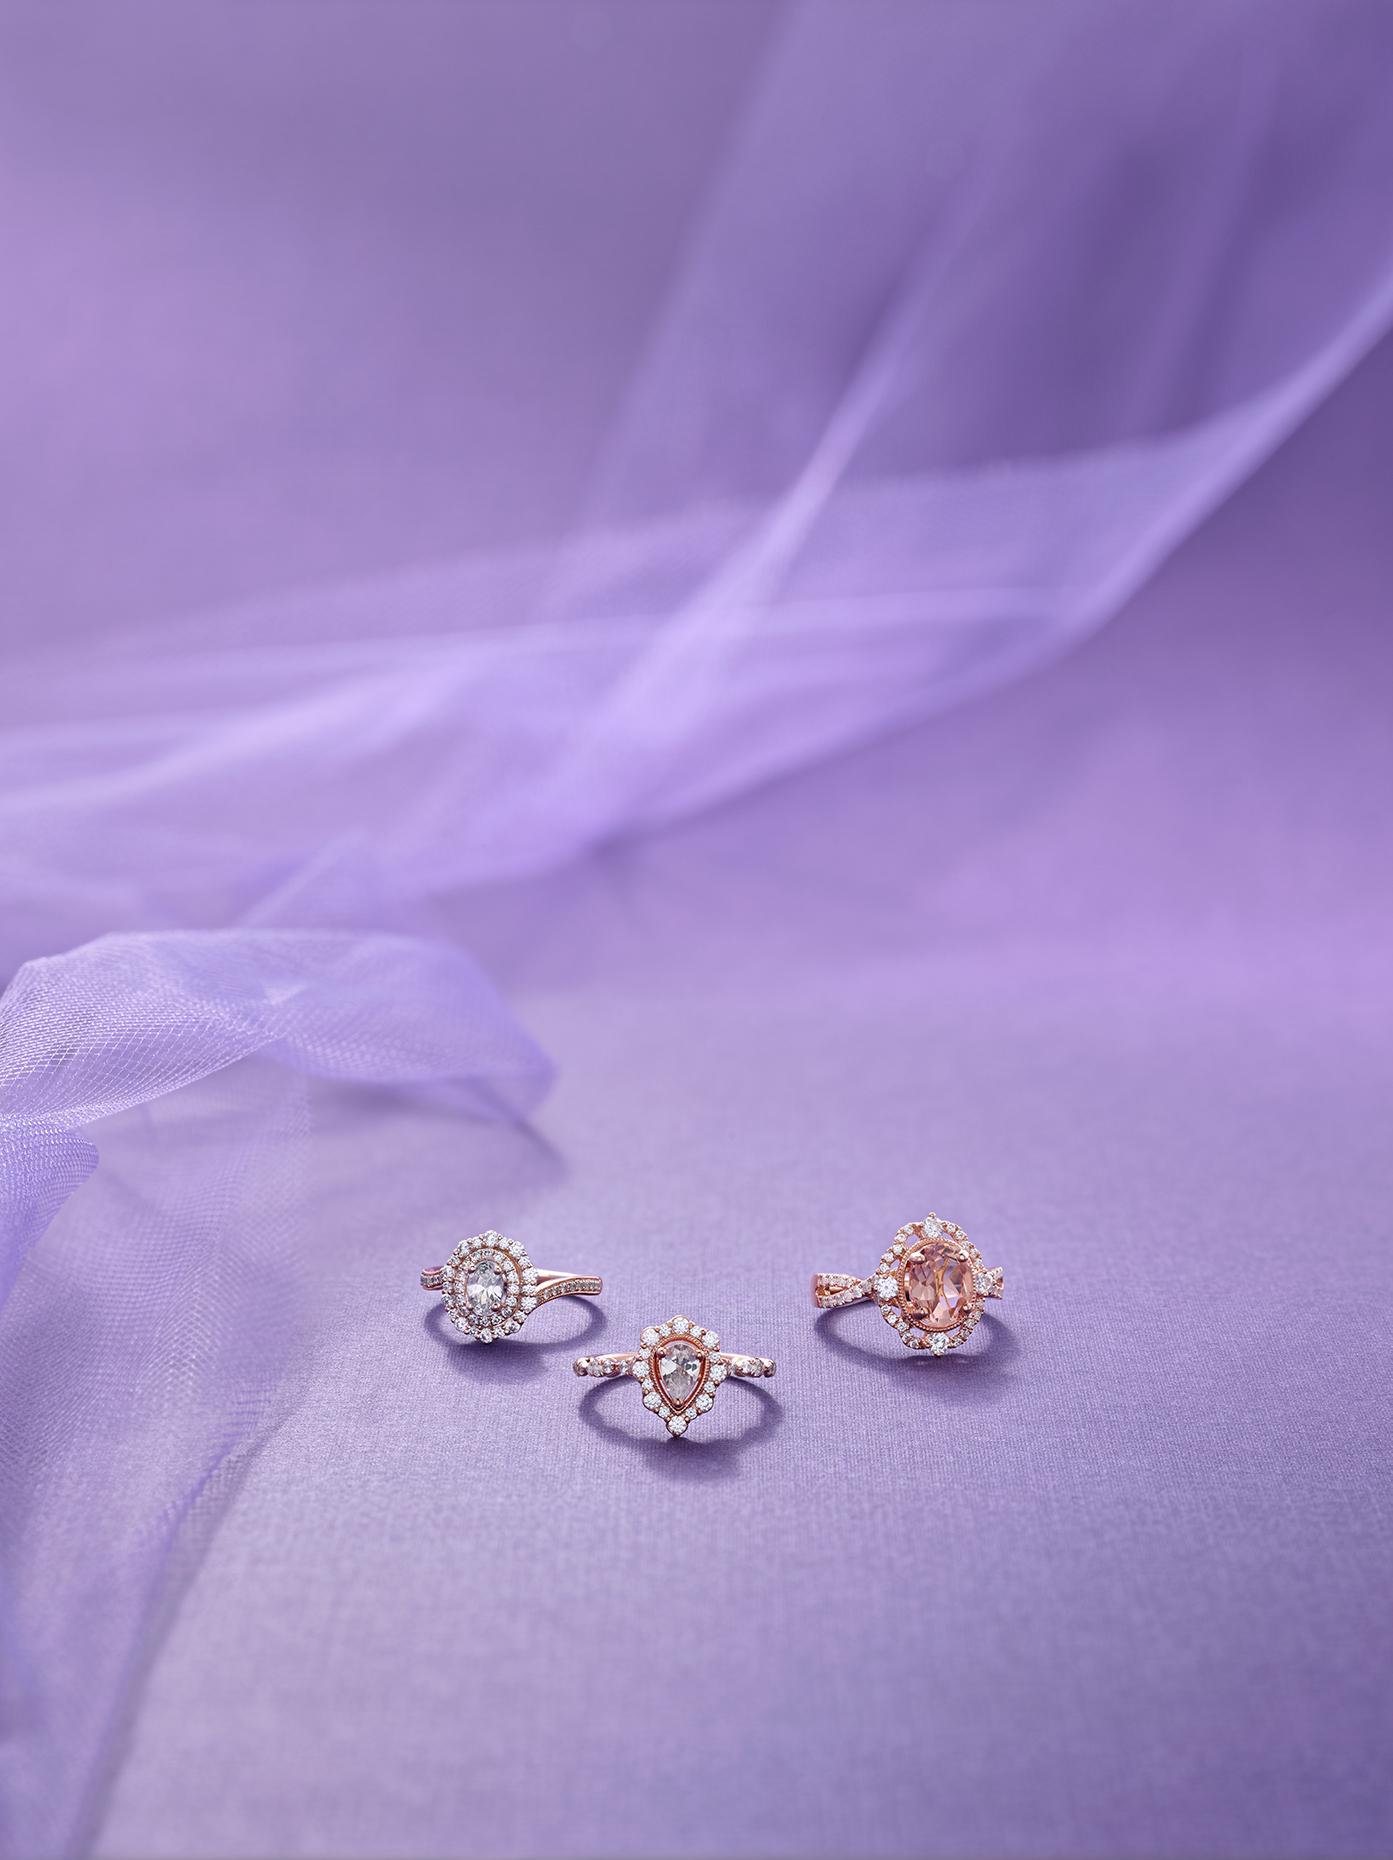 Product_photography_Jewelry_Derek_Israelsen_ZacPosen004_Diamond_.jpg